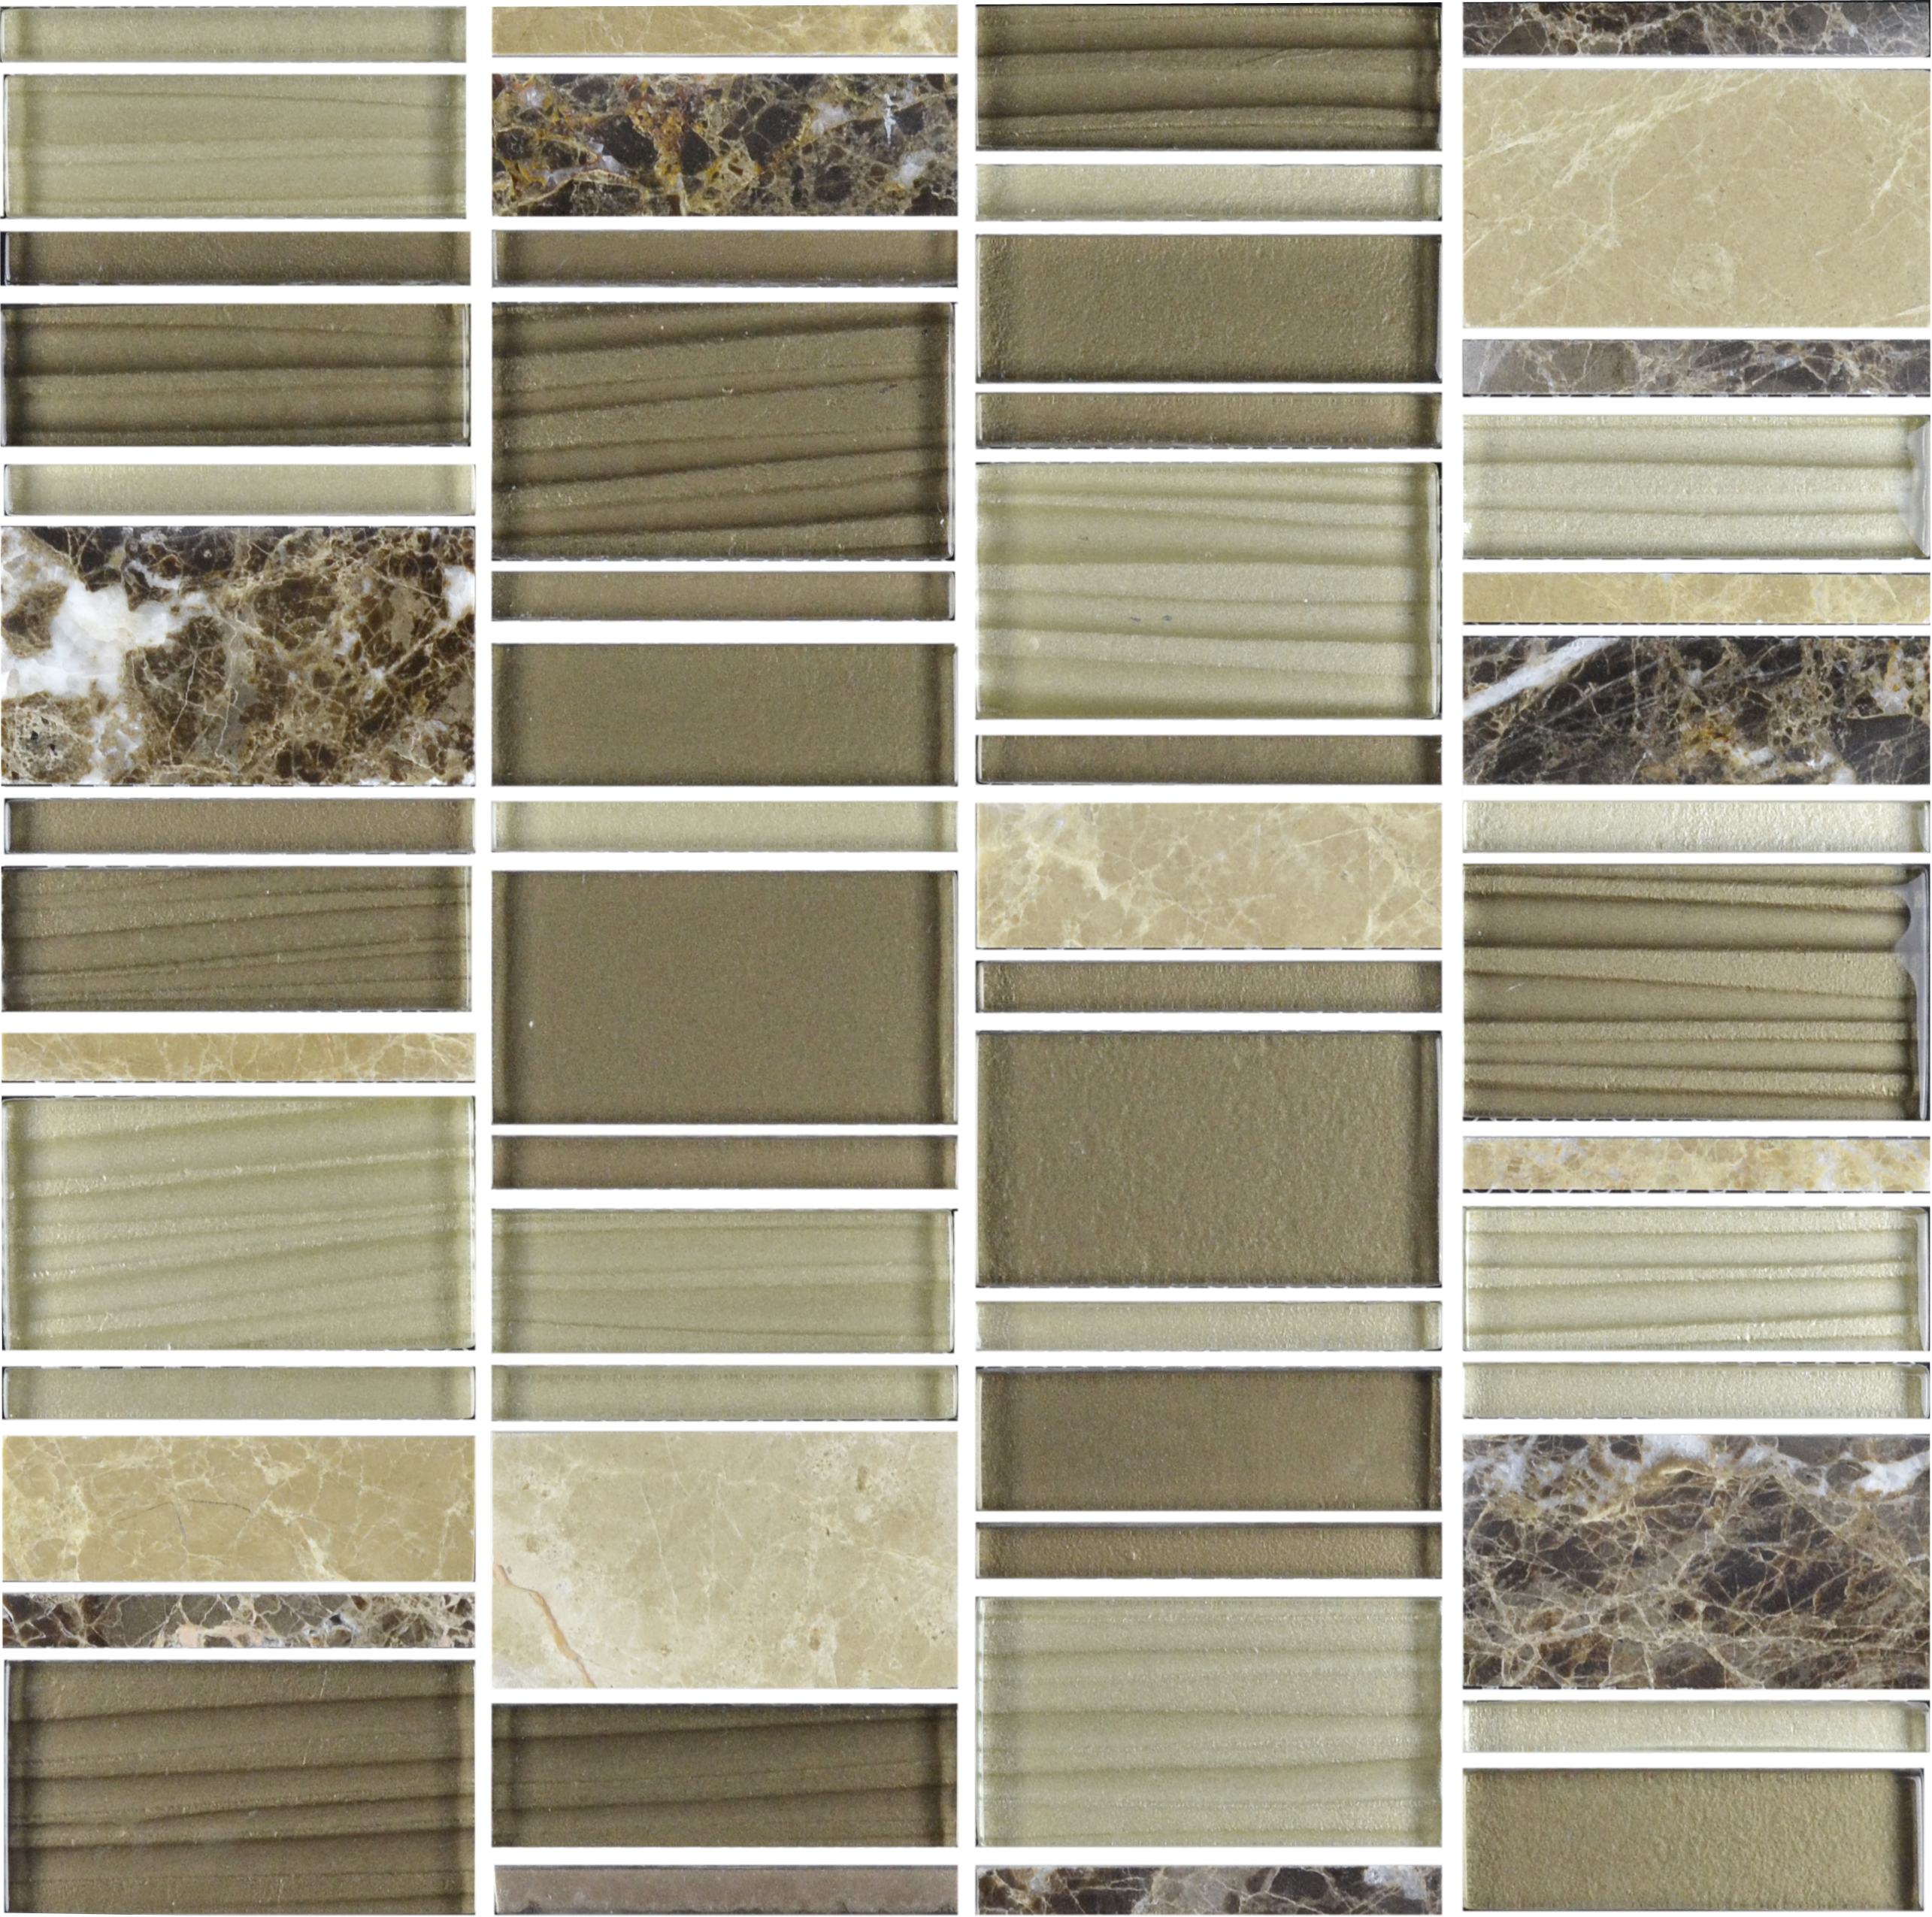 Bien Glana Braun/Beige be-PMH018 Mosaik 30x30